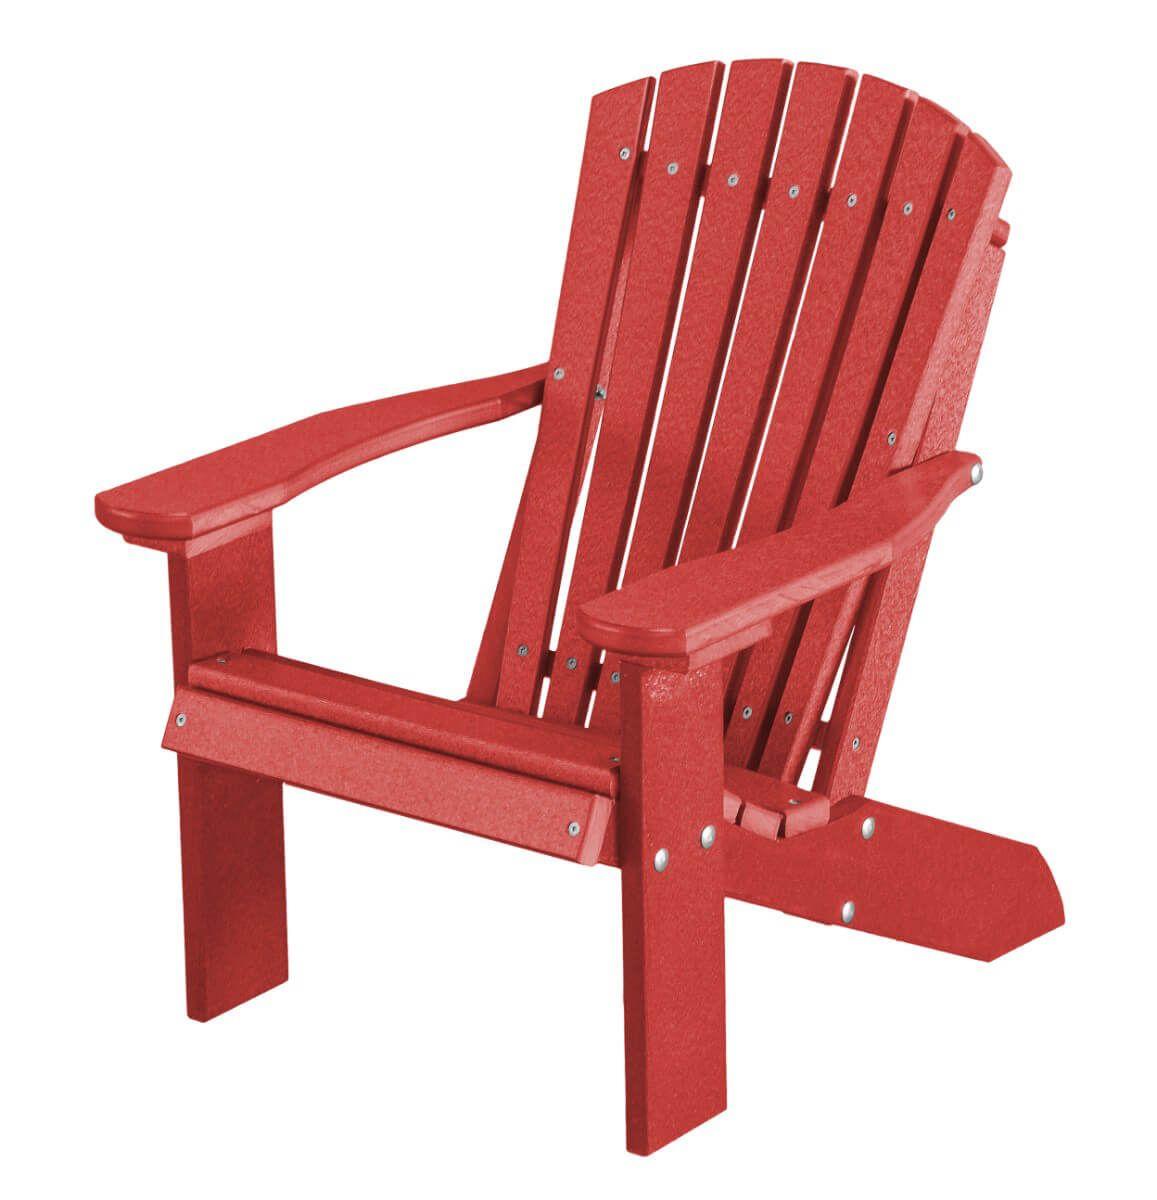 Cardinal Red Sidra Child's Adirondack Chair